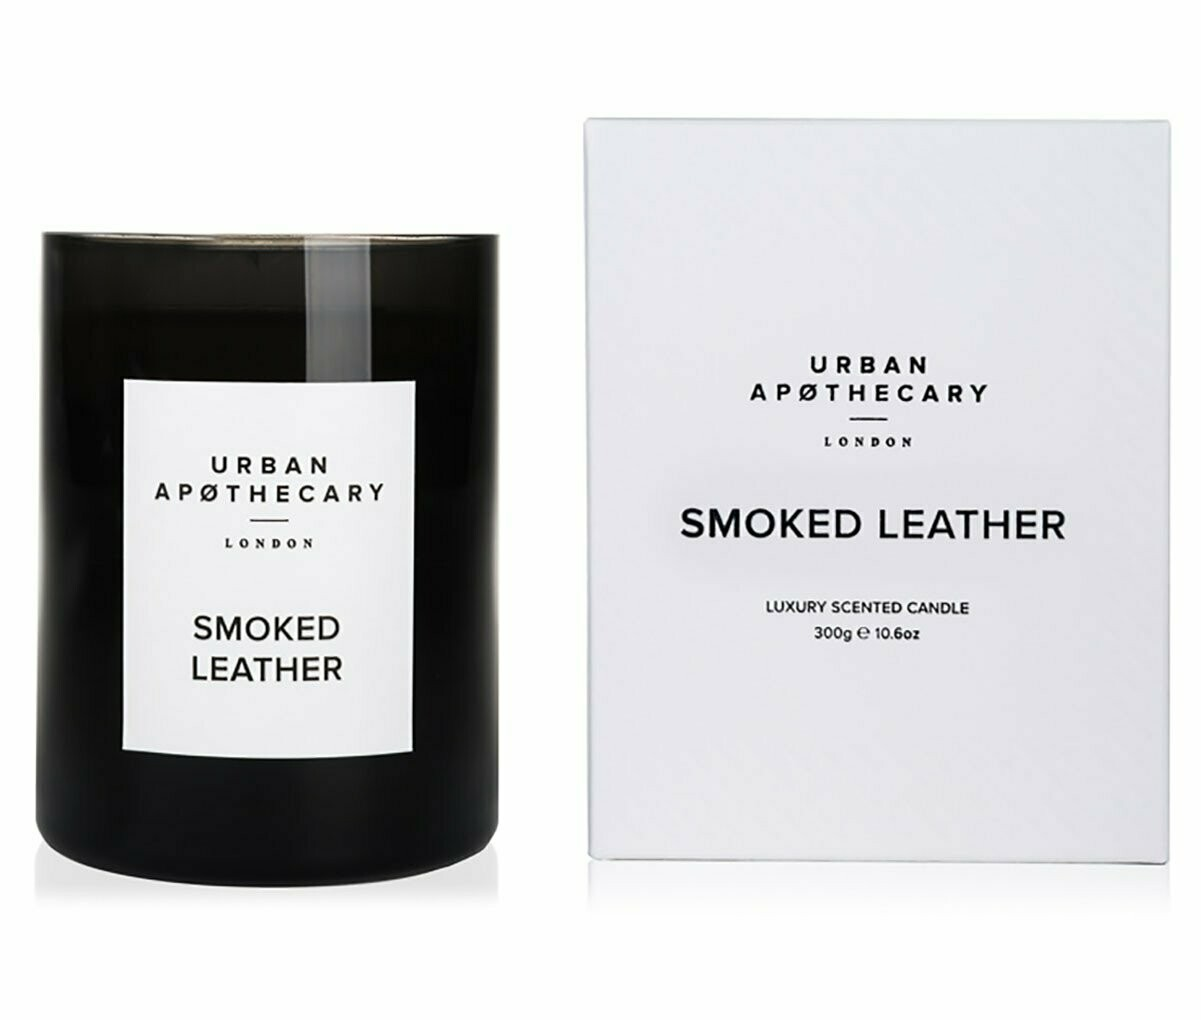 Smoked Leather Luxury Candle 300g